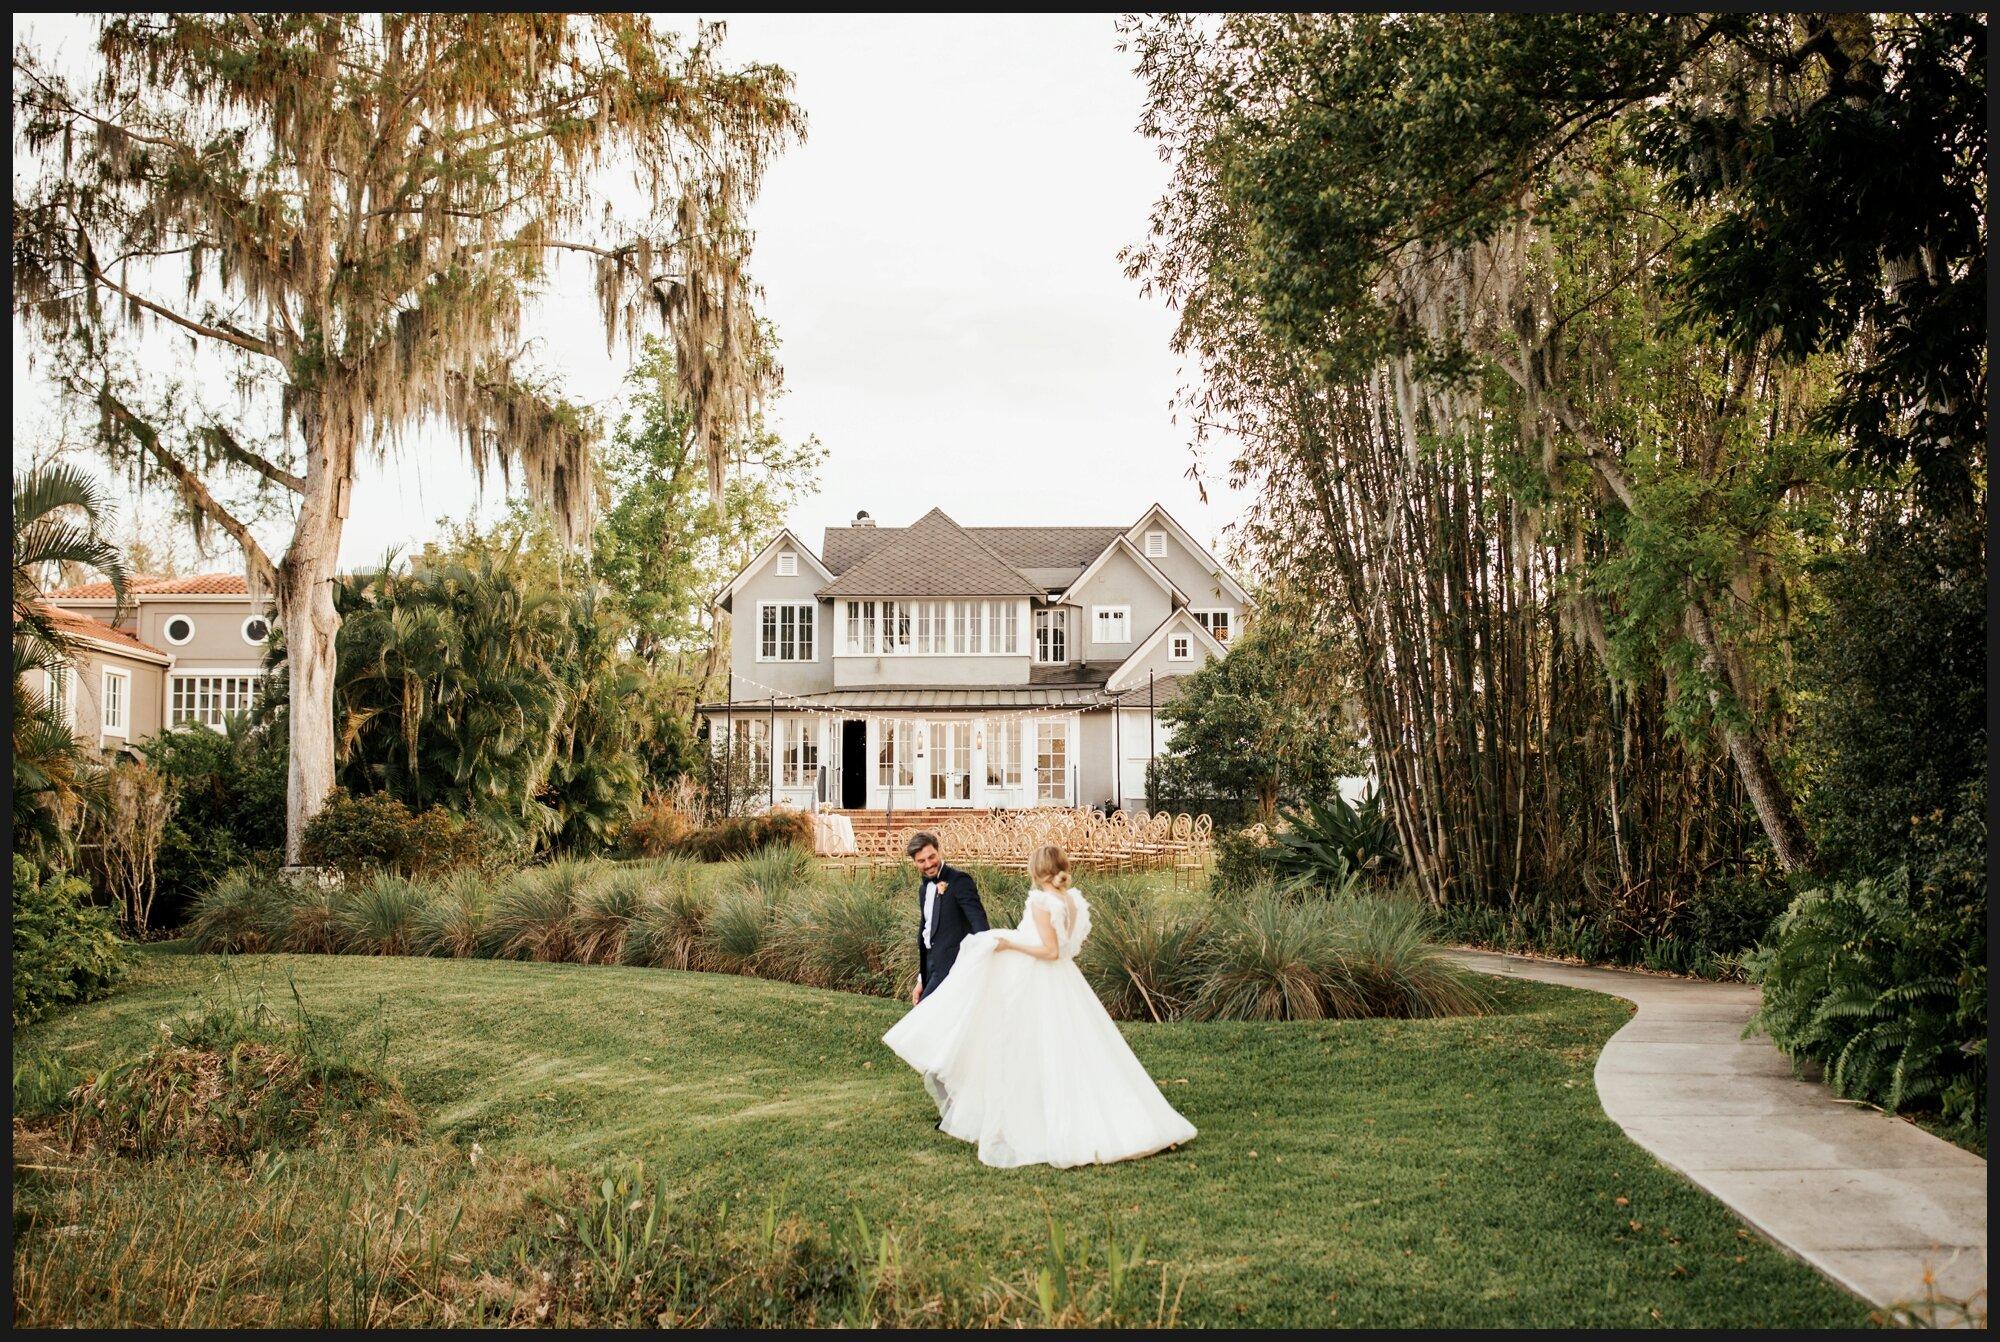 Orlando-Wedding-Photographer-destination-wedding-photographer-florida-wedding-photographer-hawaii-wedding-photographer_0763.jpg